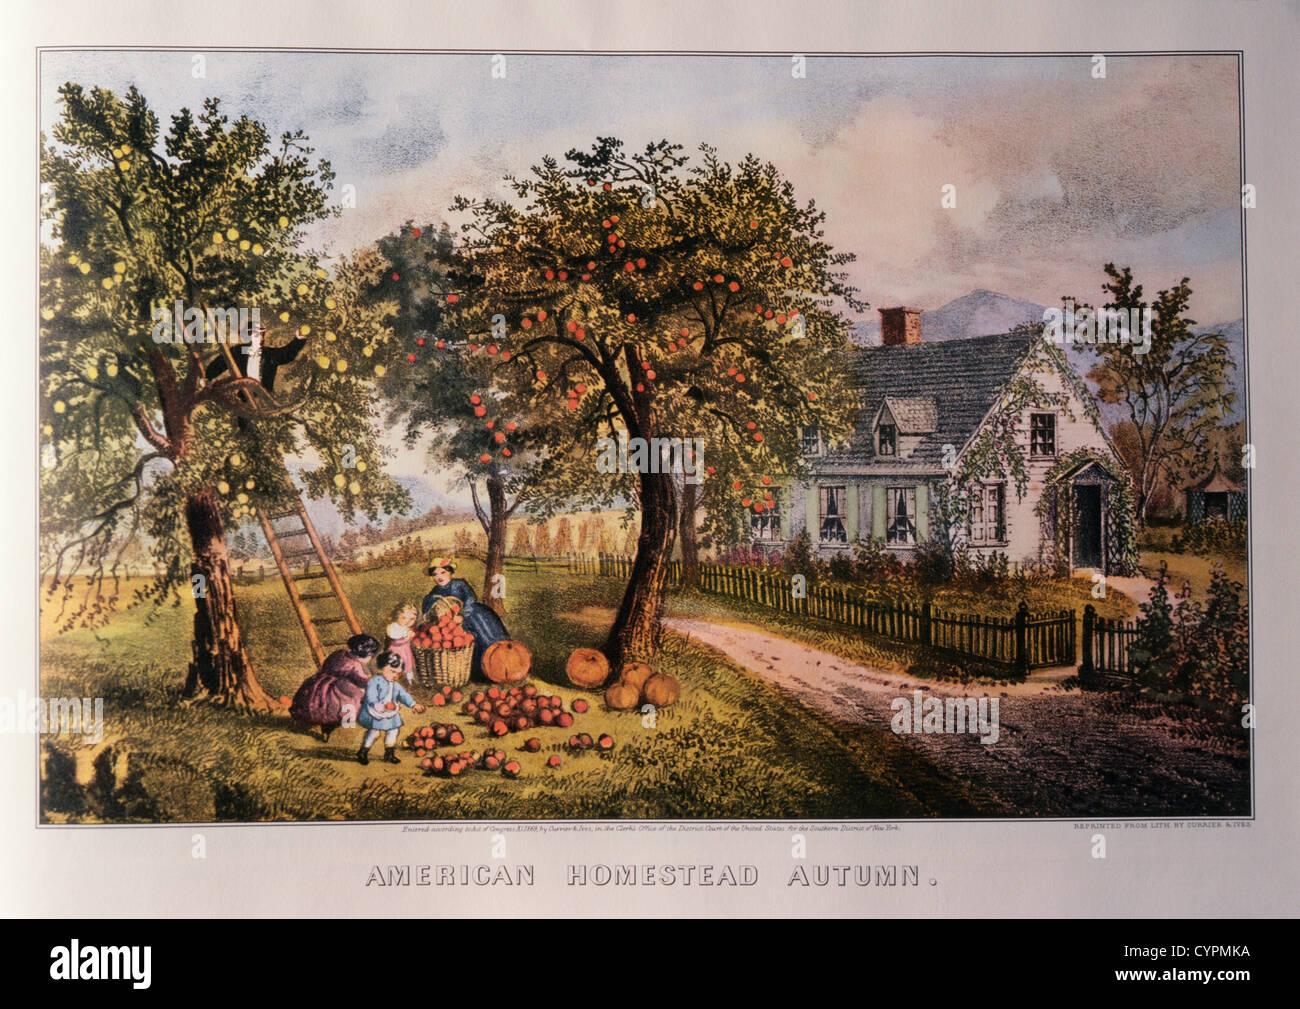 Amerikanische Homestead, Herbst, Currier & Ives, Lithographie, 1869 Stockbild